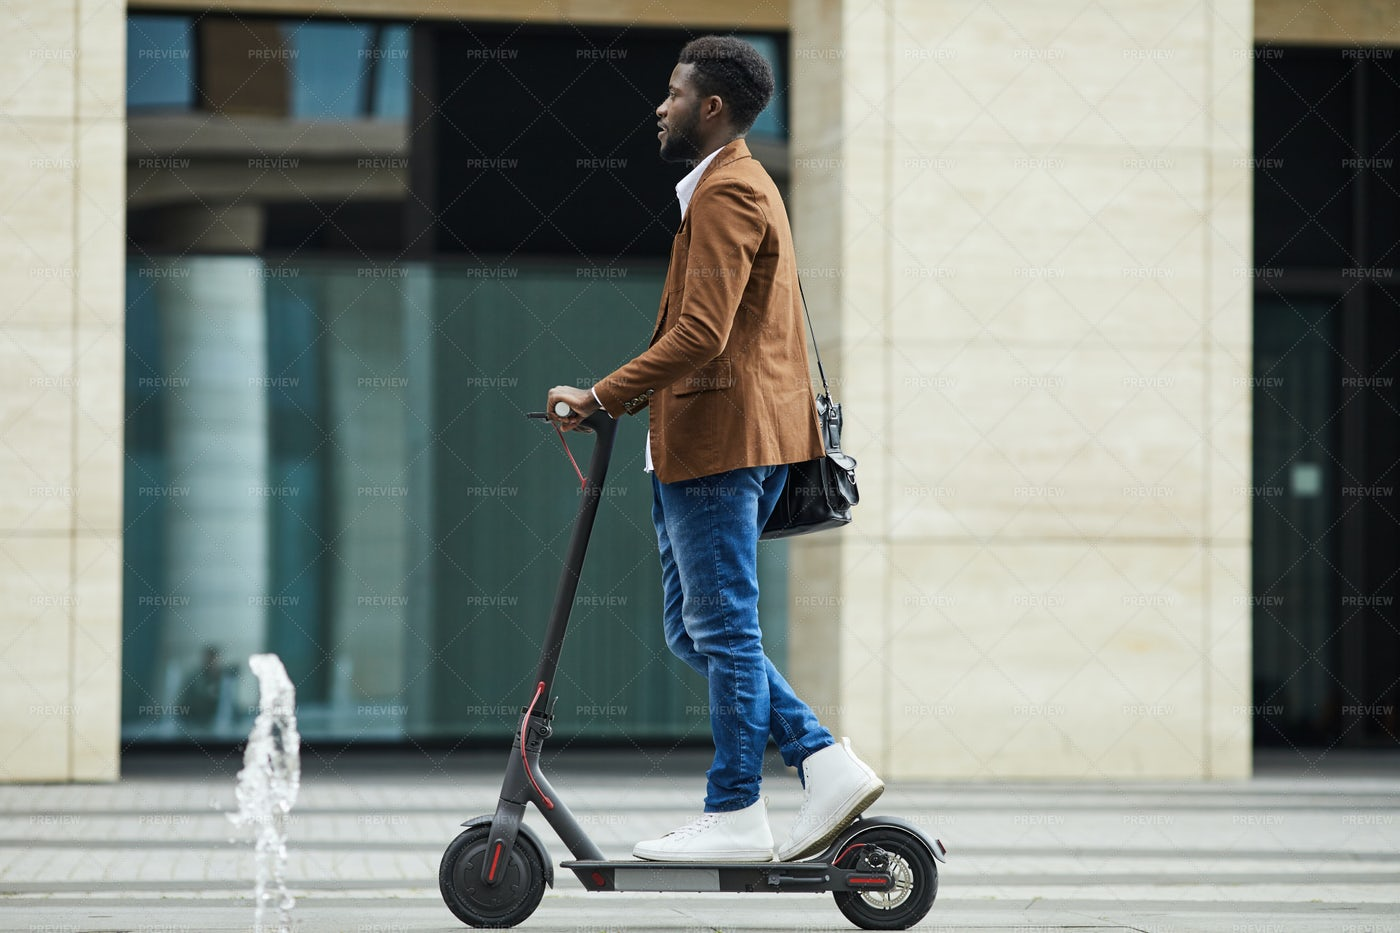 African Man Riding Electric Scooter...: Stock Photos